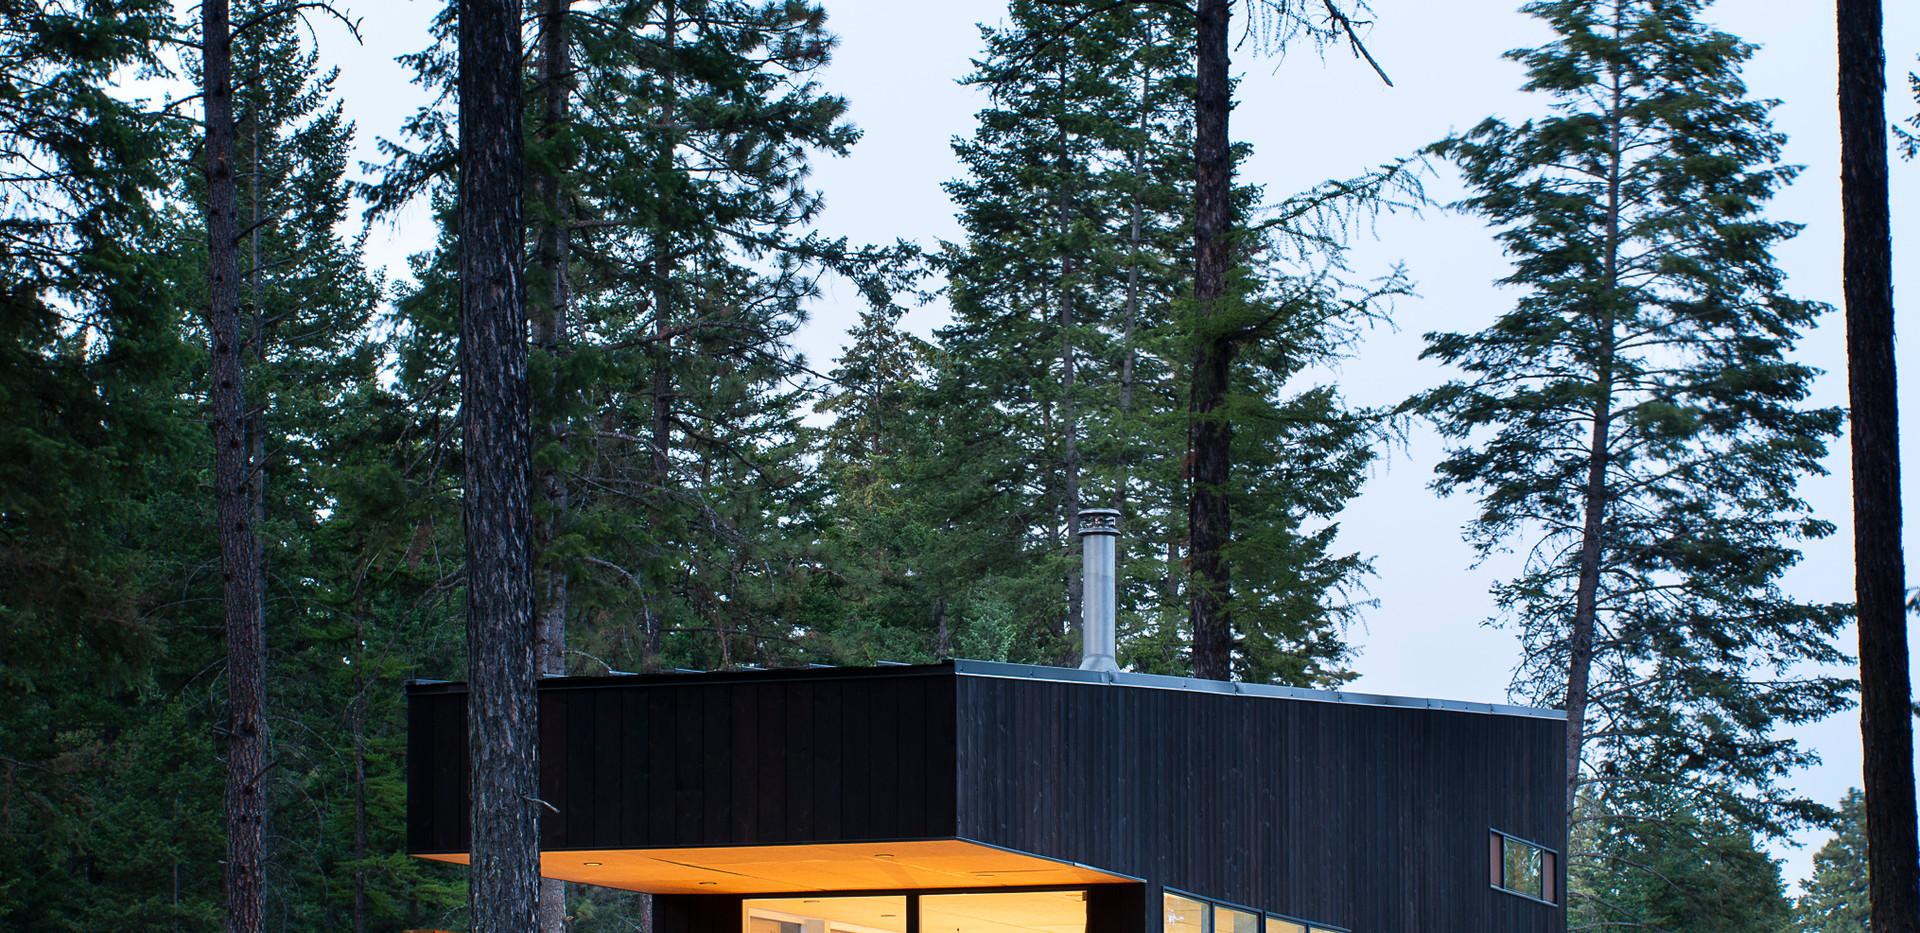 Stoner Creek Cabins